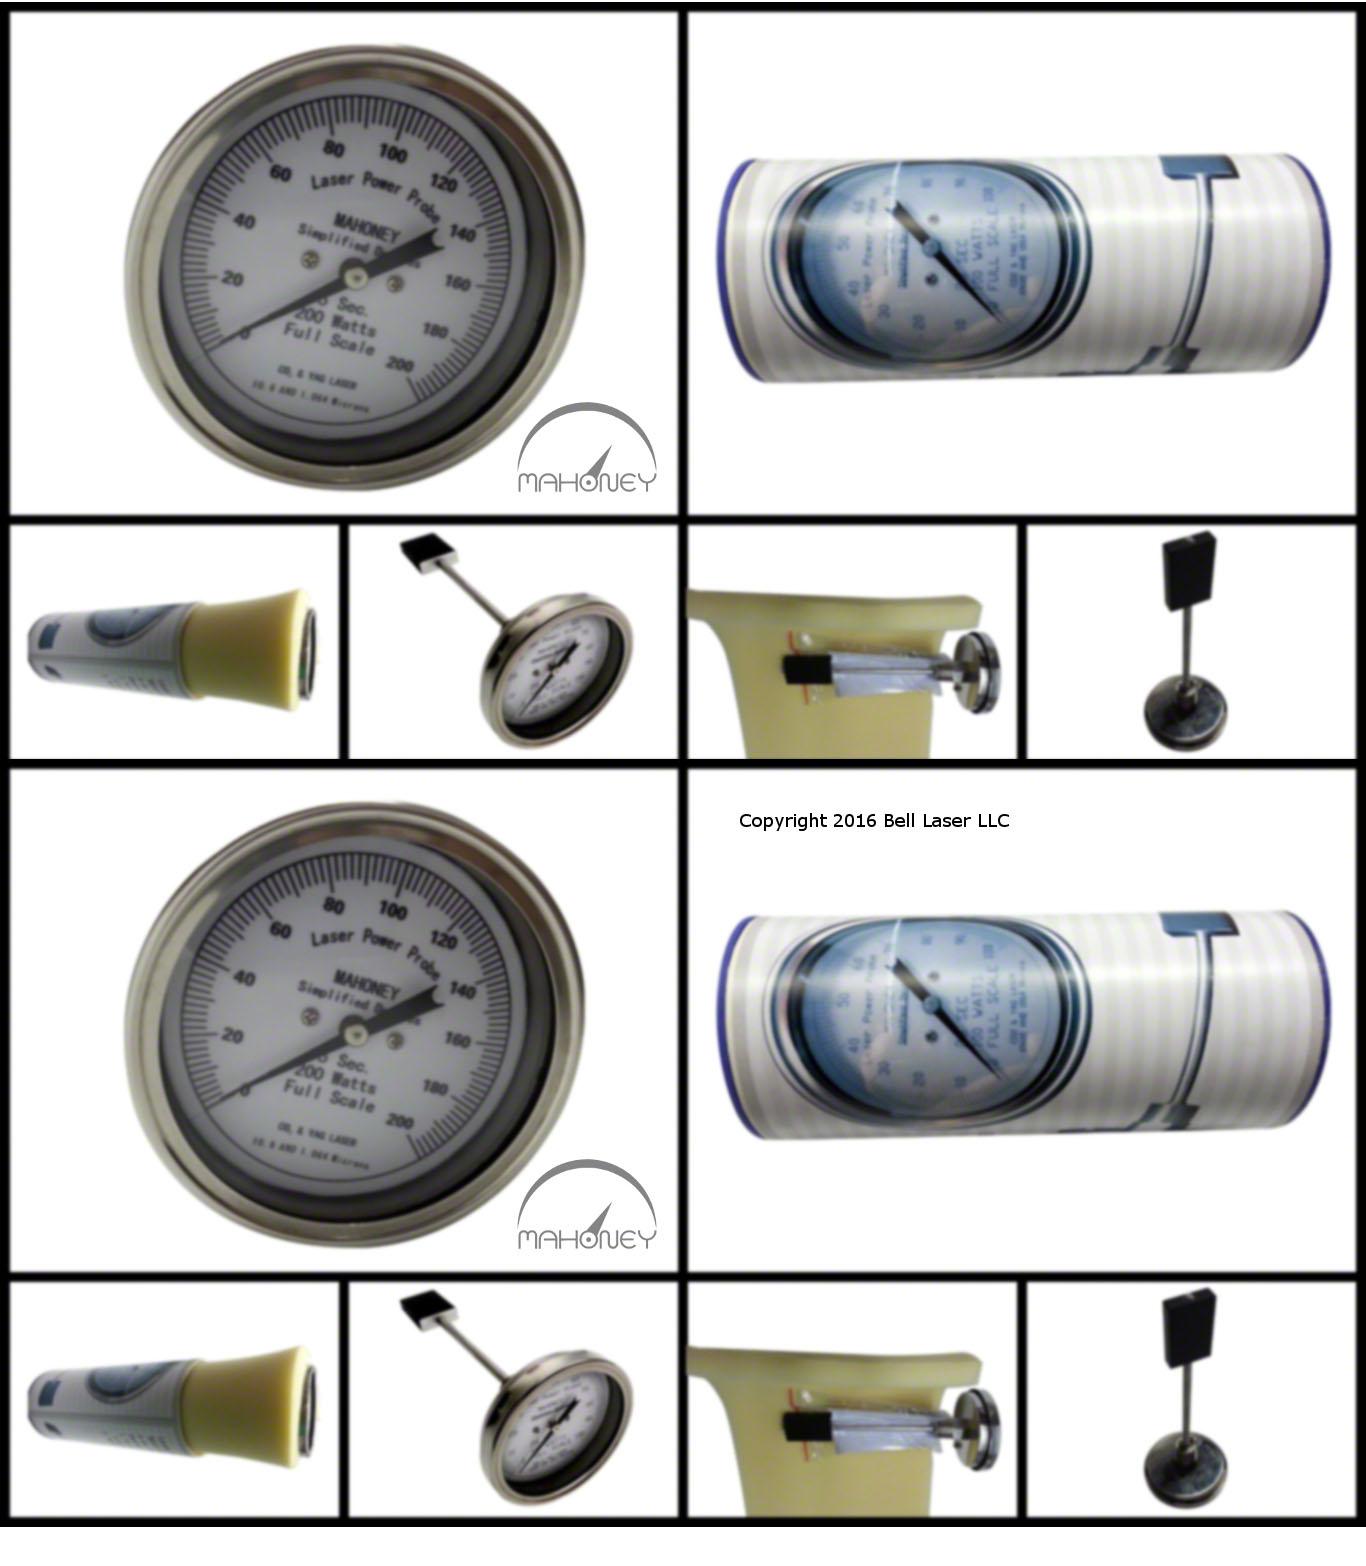 200_watt_Mahoney_CO2_laser_power_meter_probe_collage_x2_Mahoney